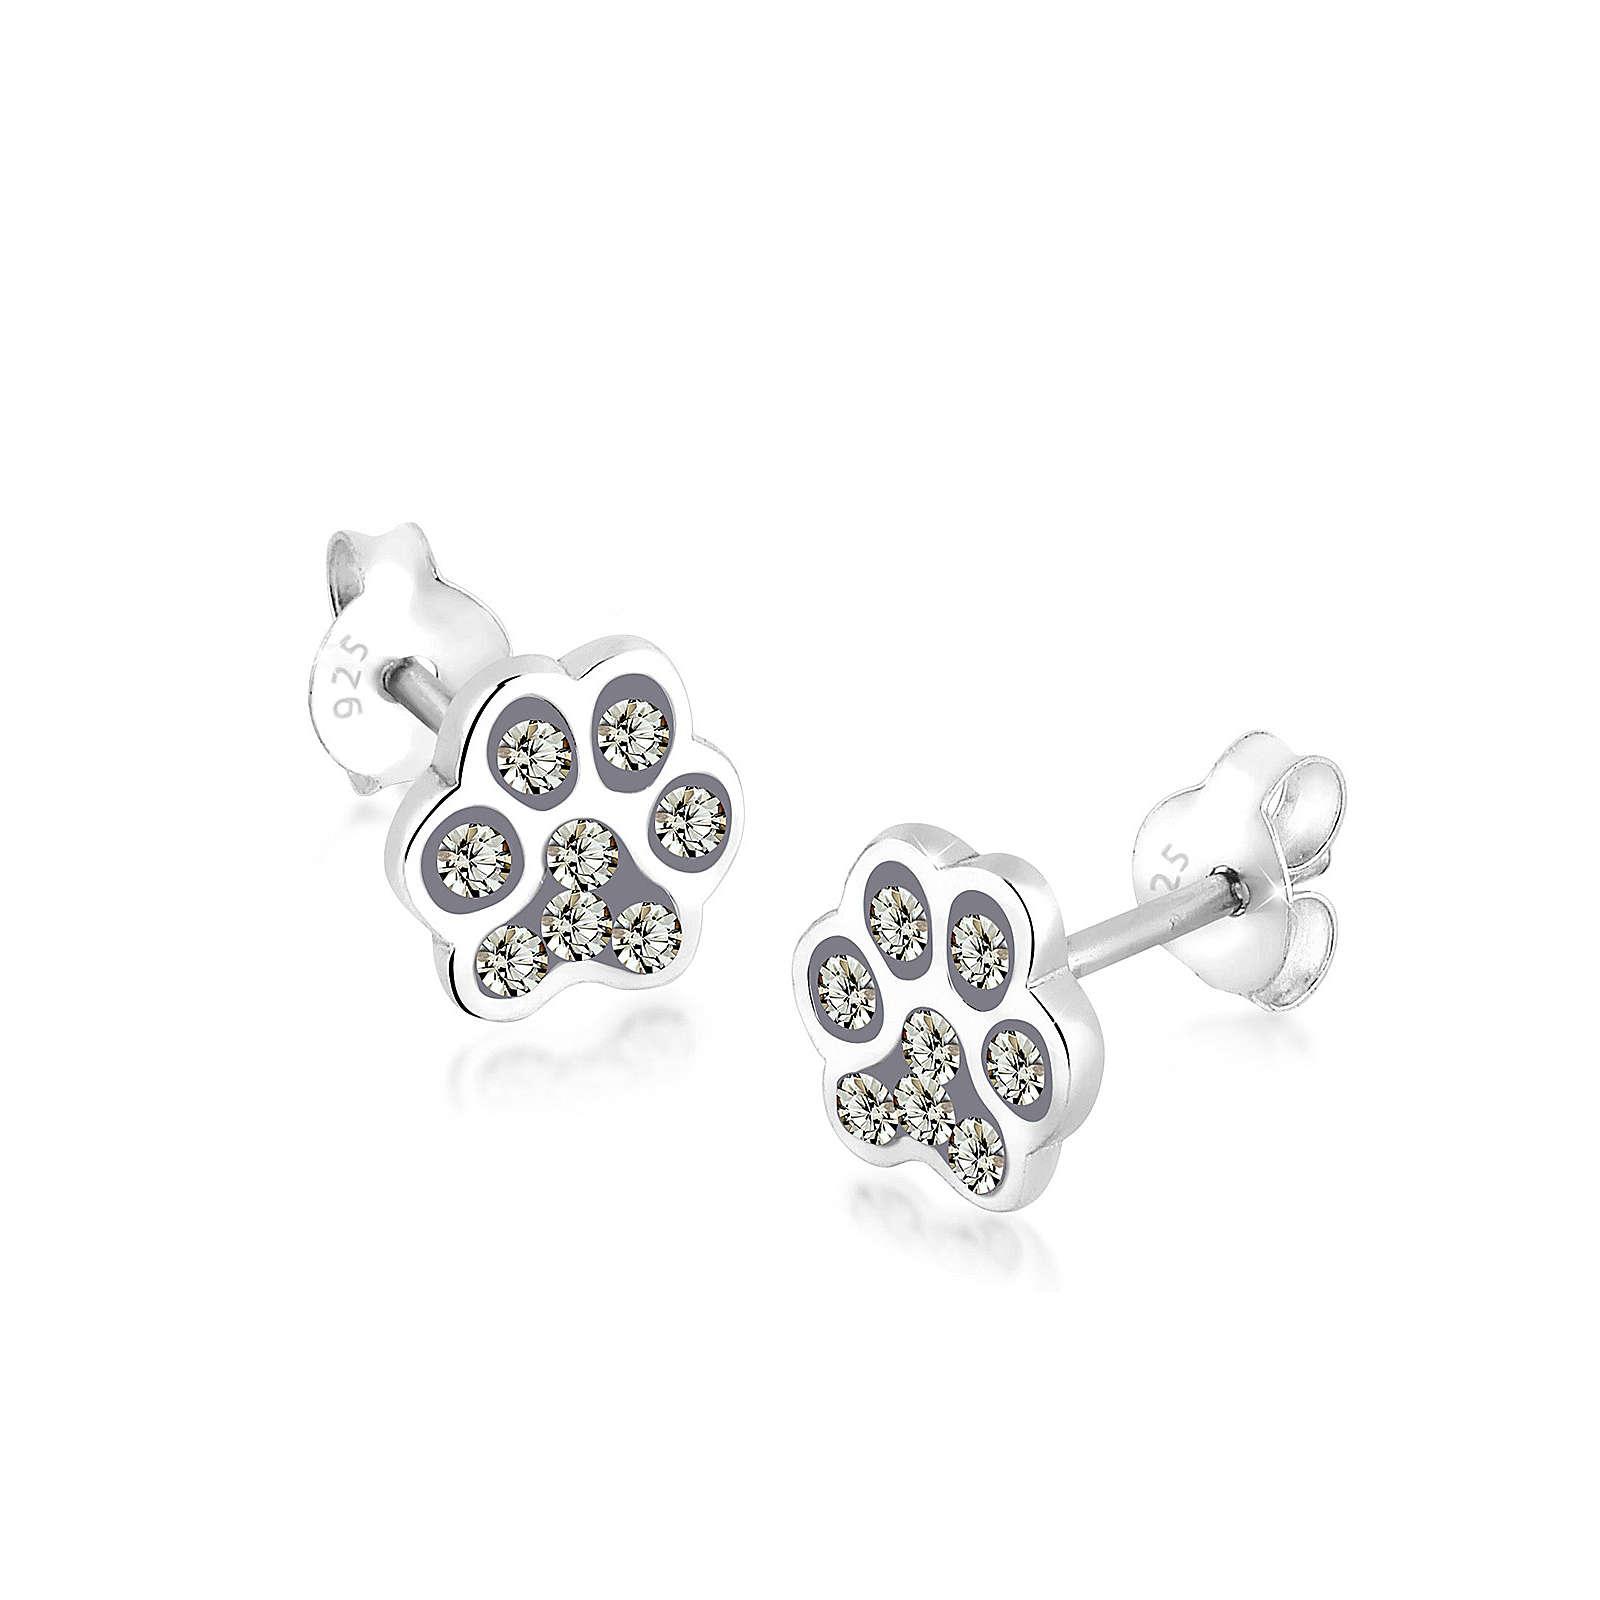 Elli Ohrringe Katzenpfoten Pfote Swarovski® Kristalle Silber Ohrringe grau Damen